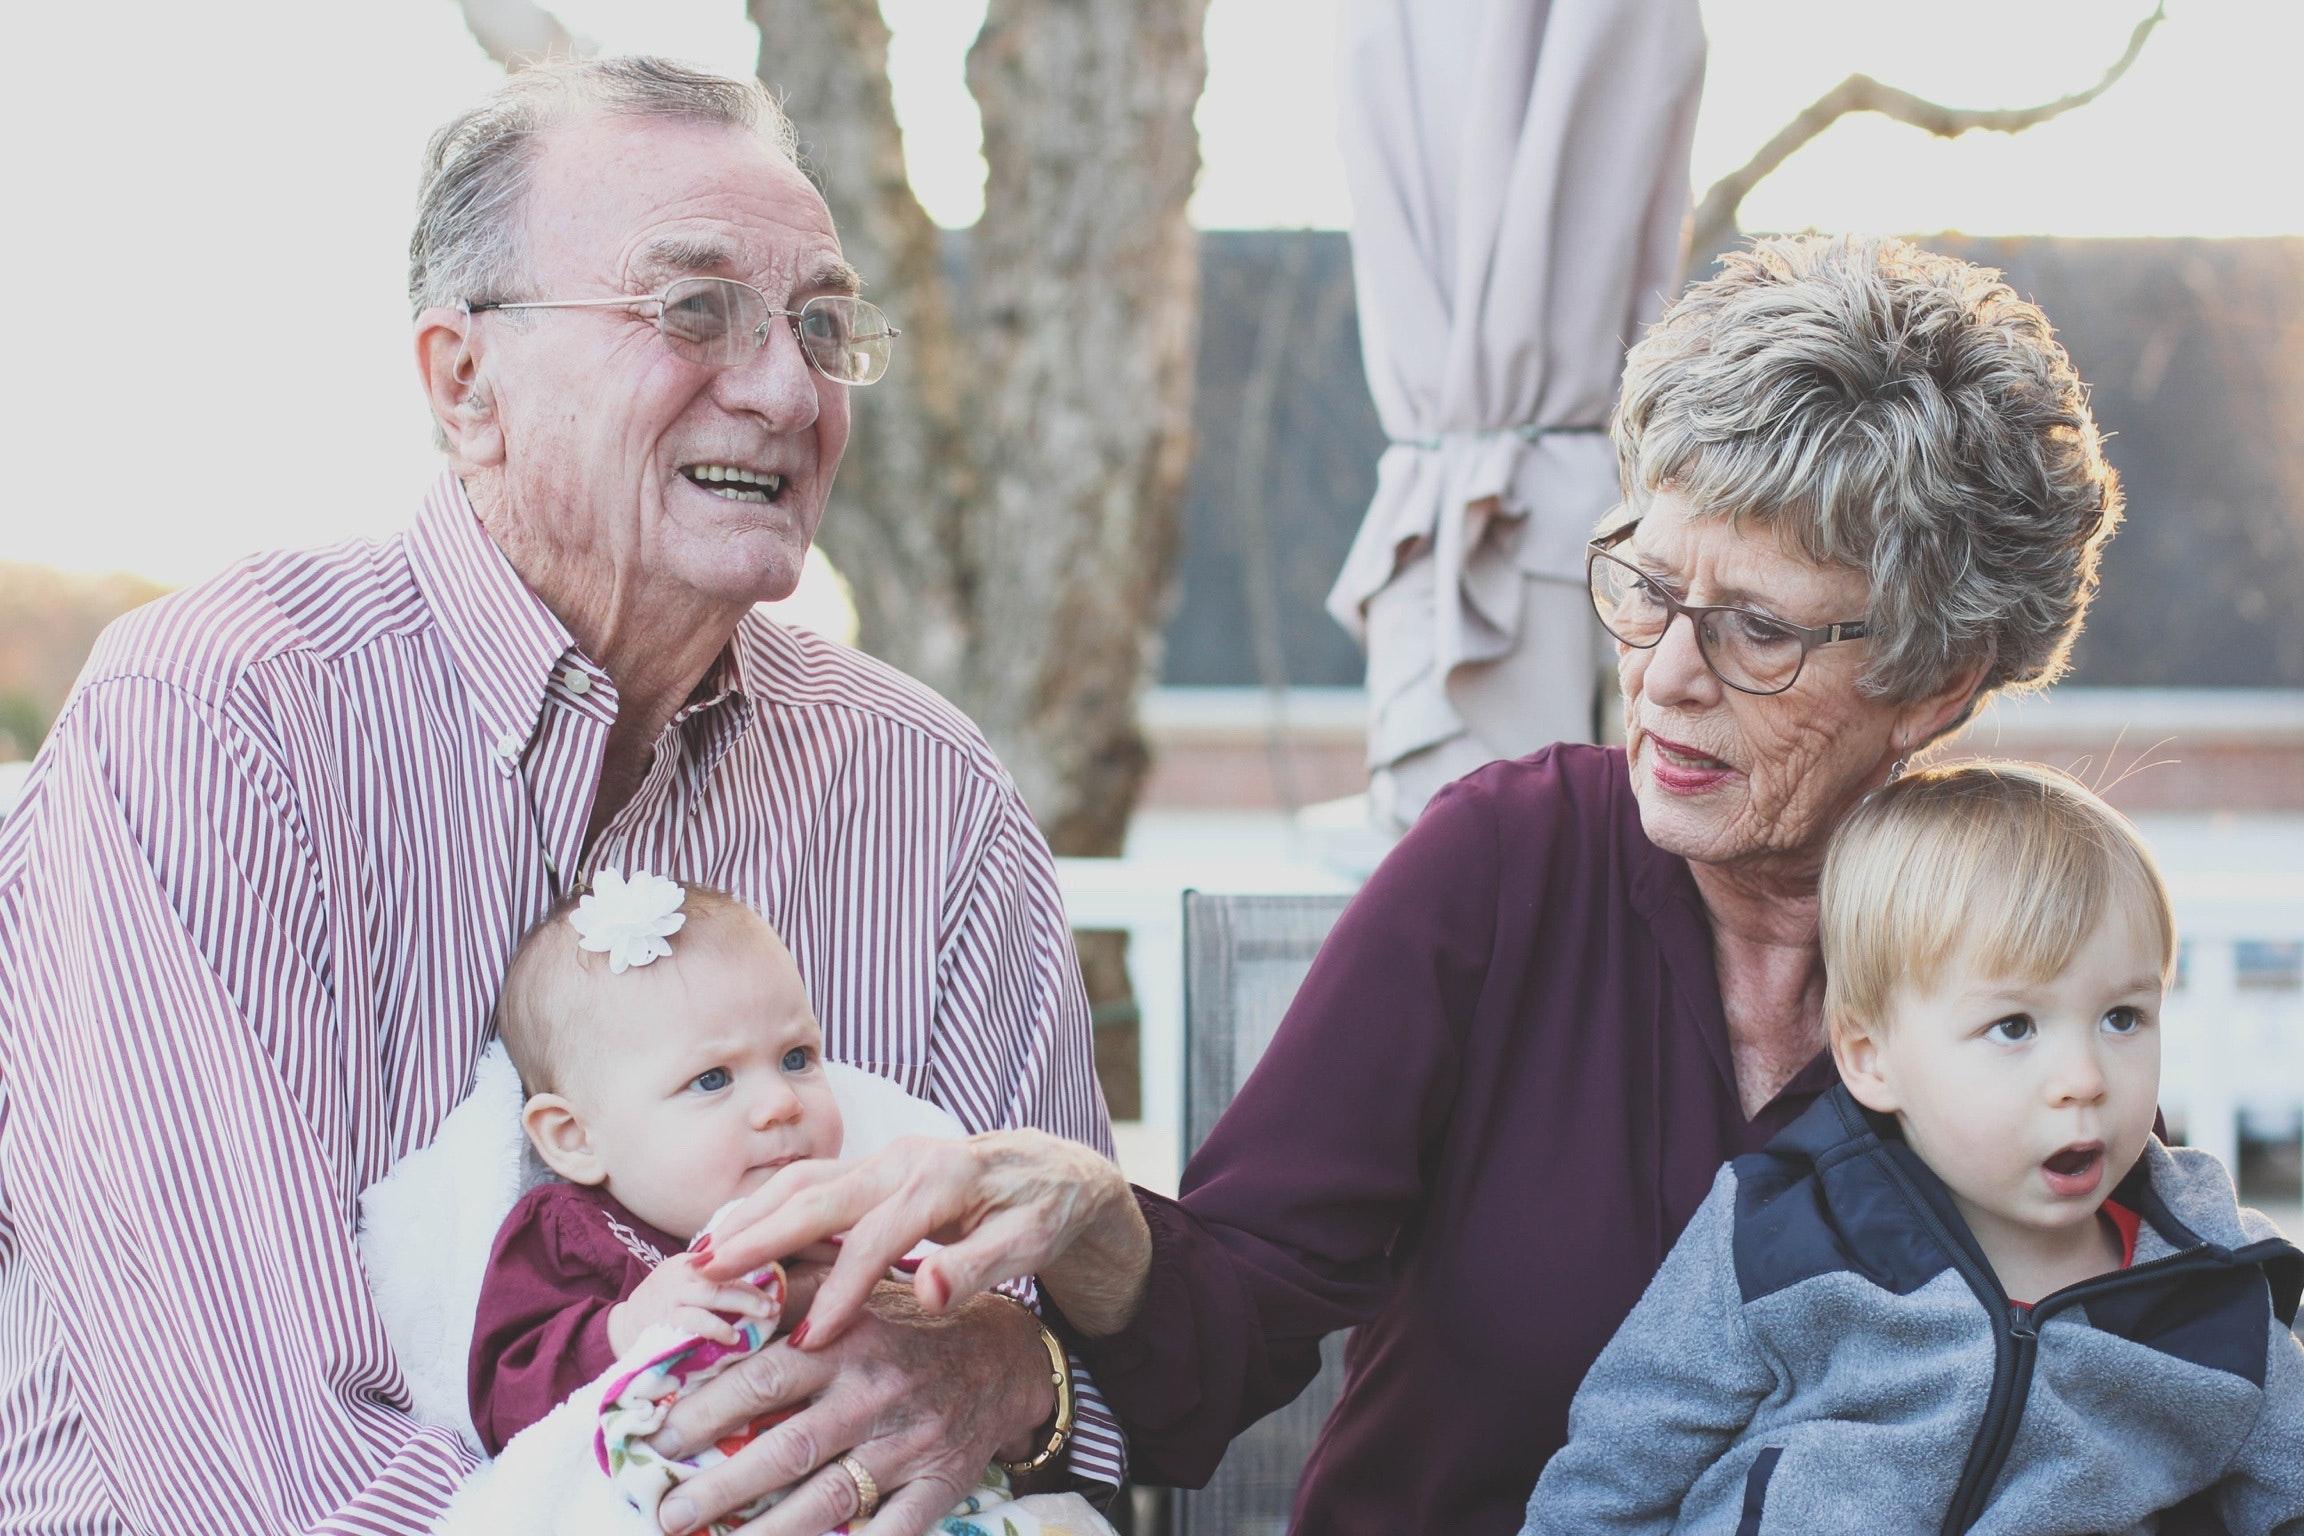 Ouderen - senioren - lening afsluiten